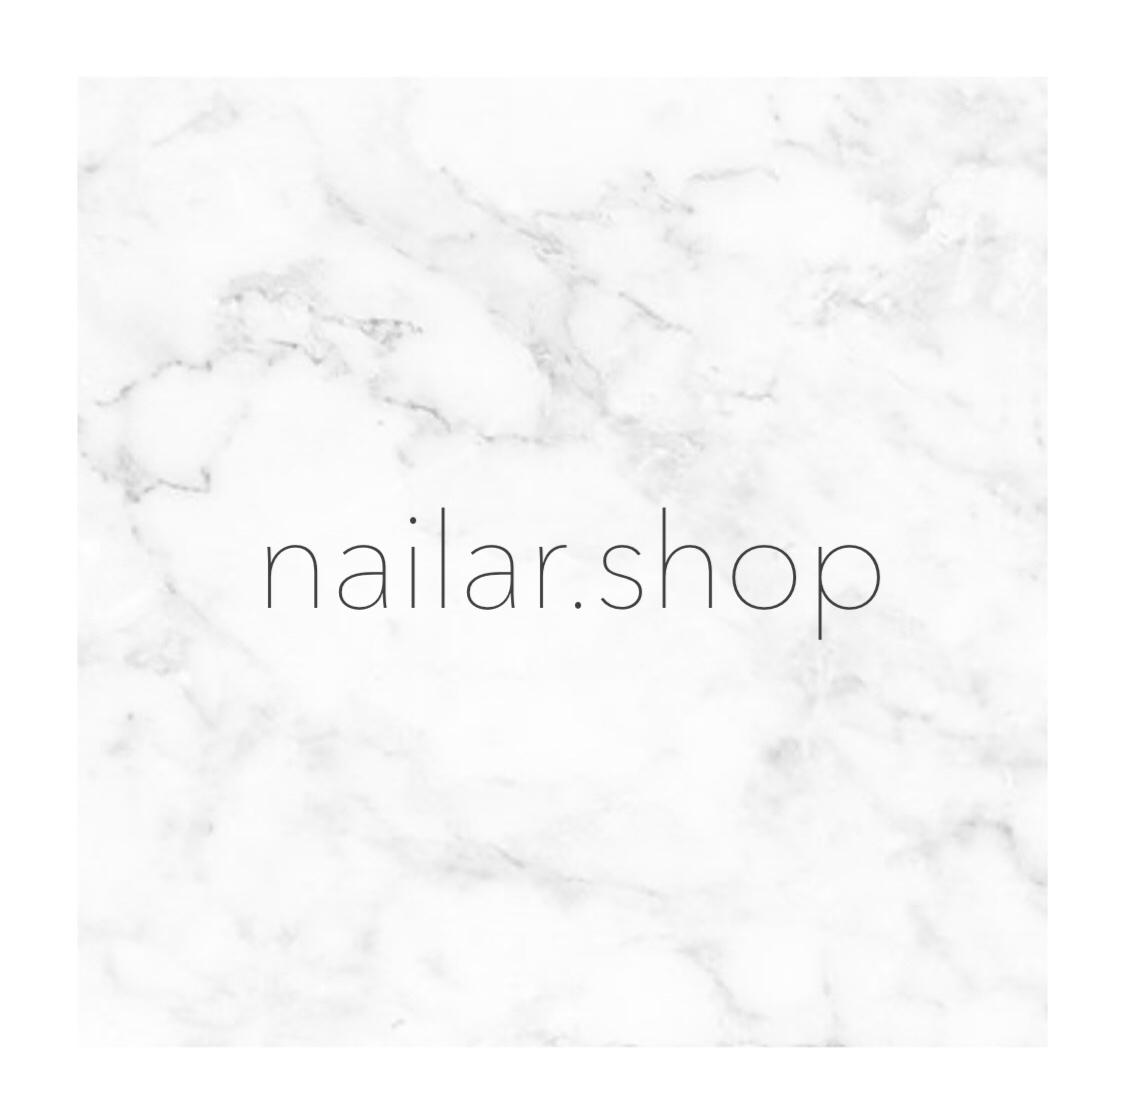 *nail ar shop*-ネイルチップ-*